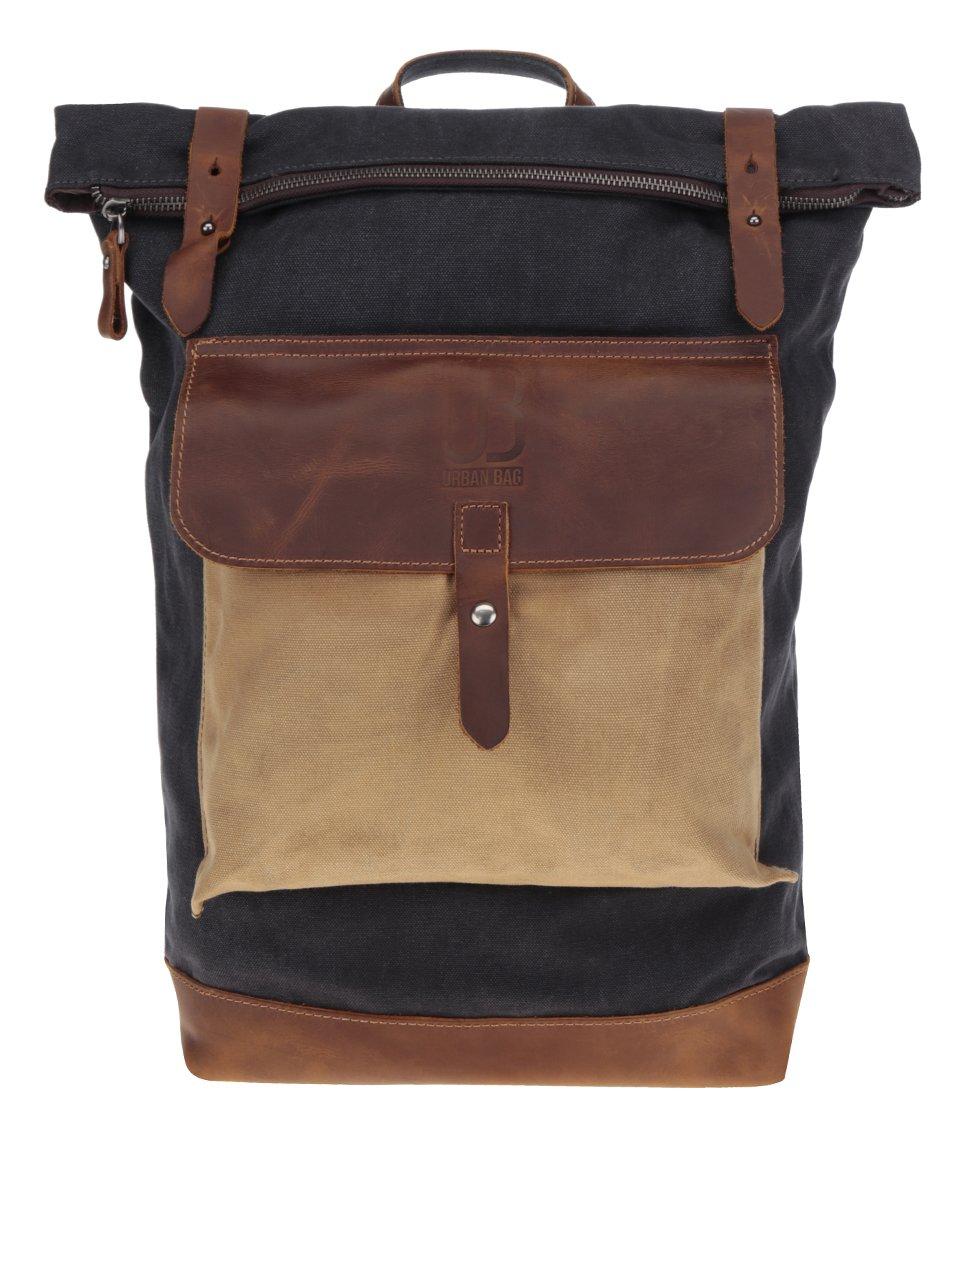 Tmavosivý unisex batoh Urban Bag